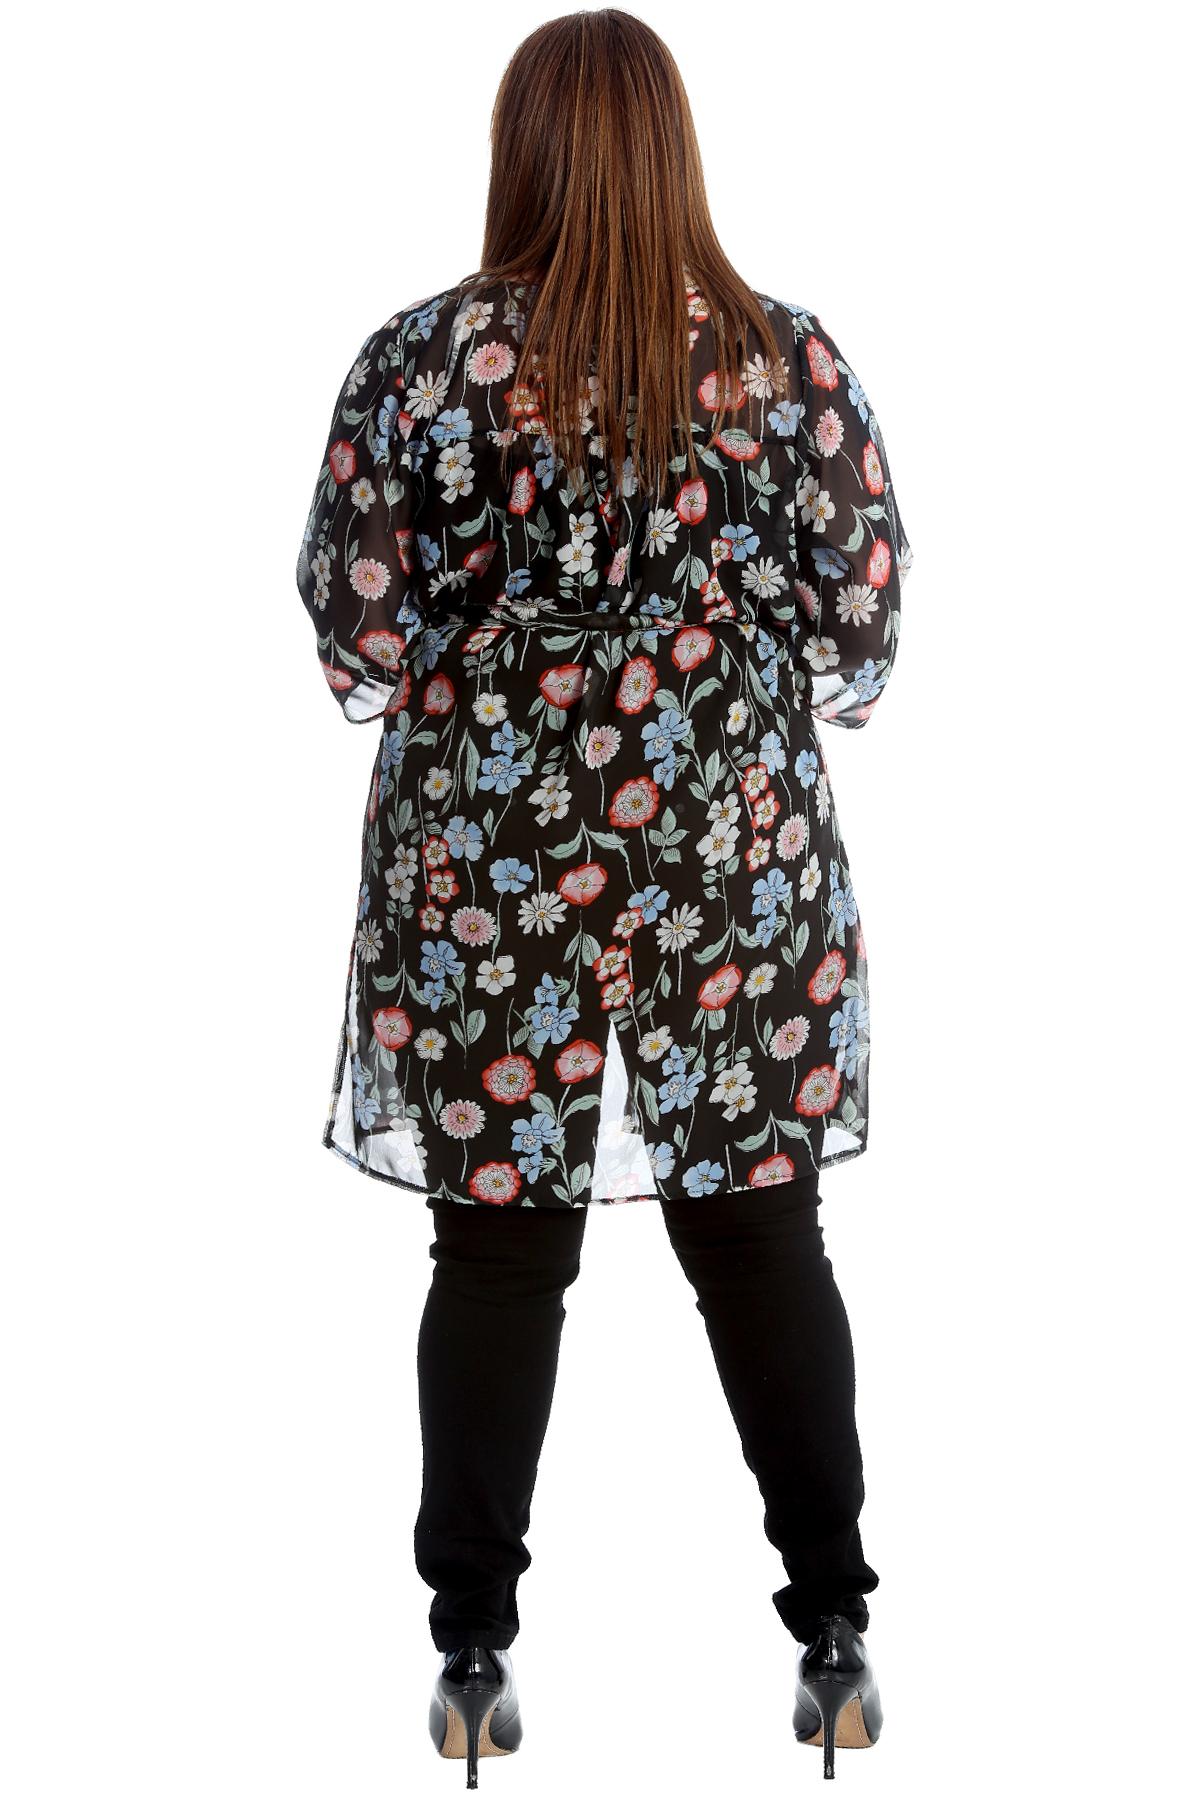 neue frauen bergr e strickjacke damen chiffon blumen druck krawatte vorne lang ebay. Black Bedroom Furniture Sets. Home Design Ideas